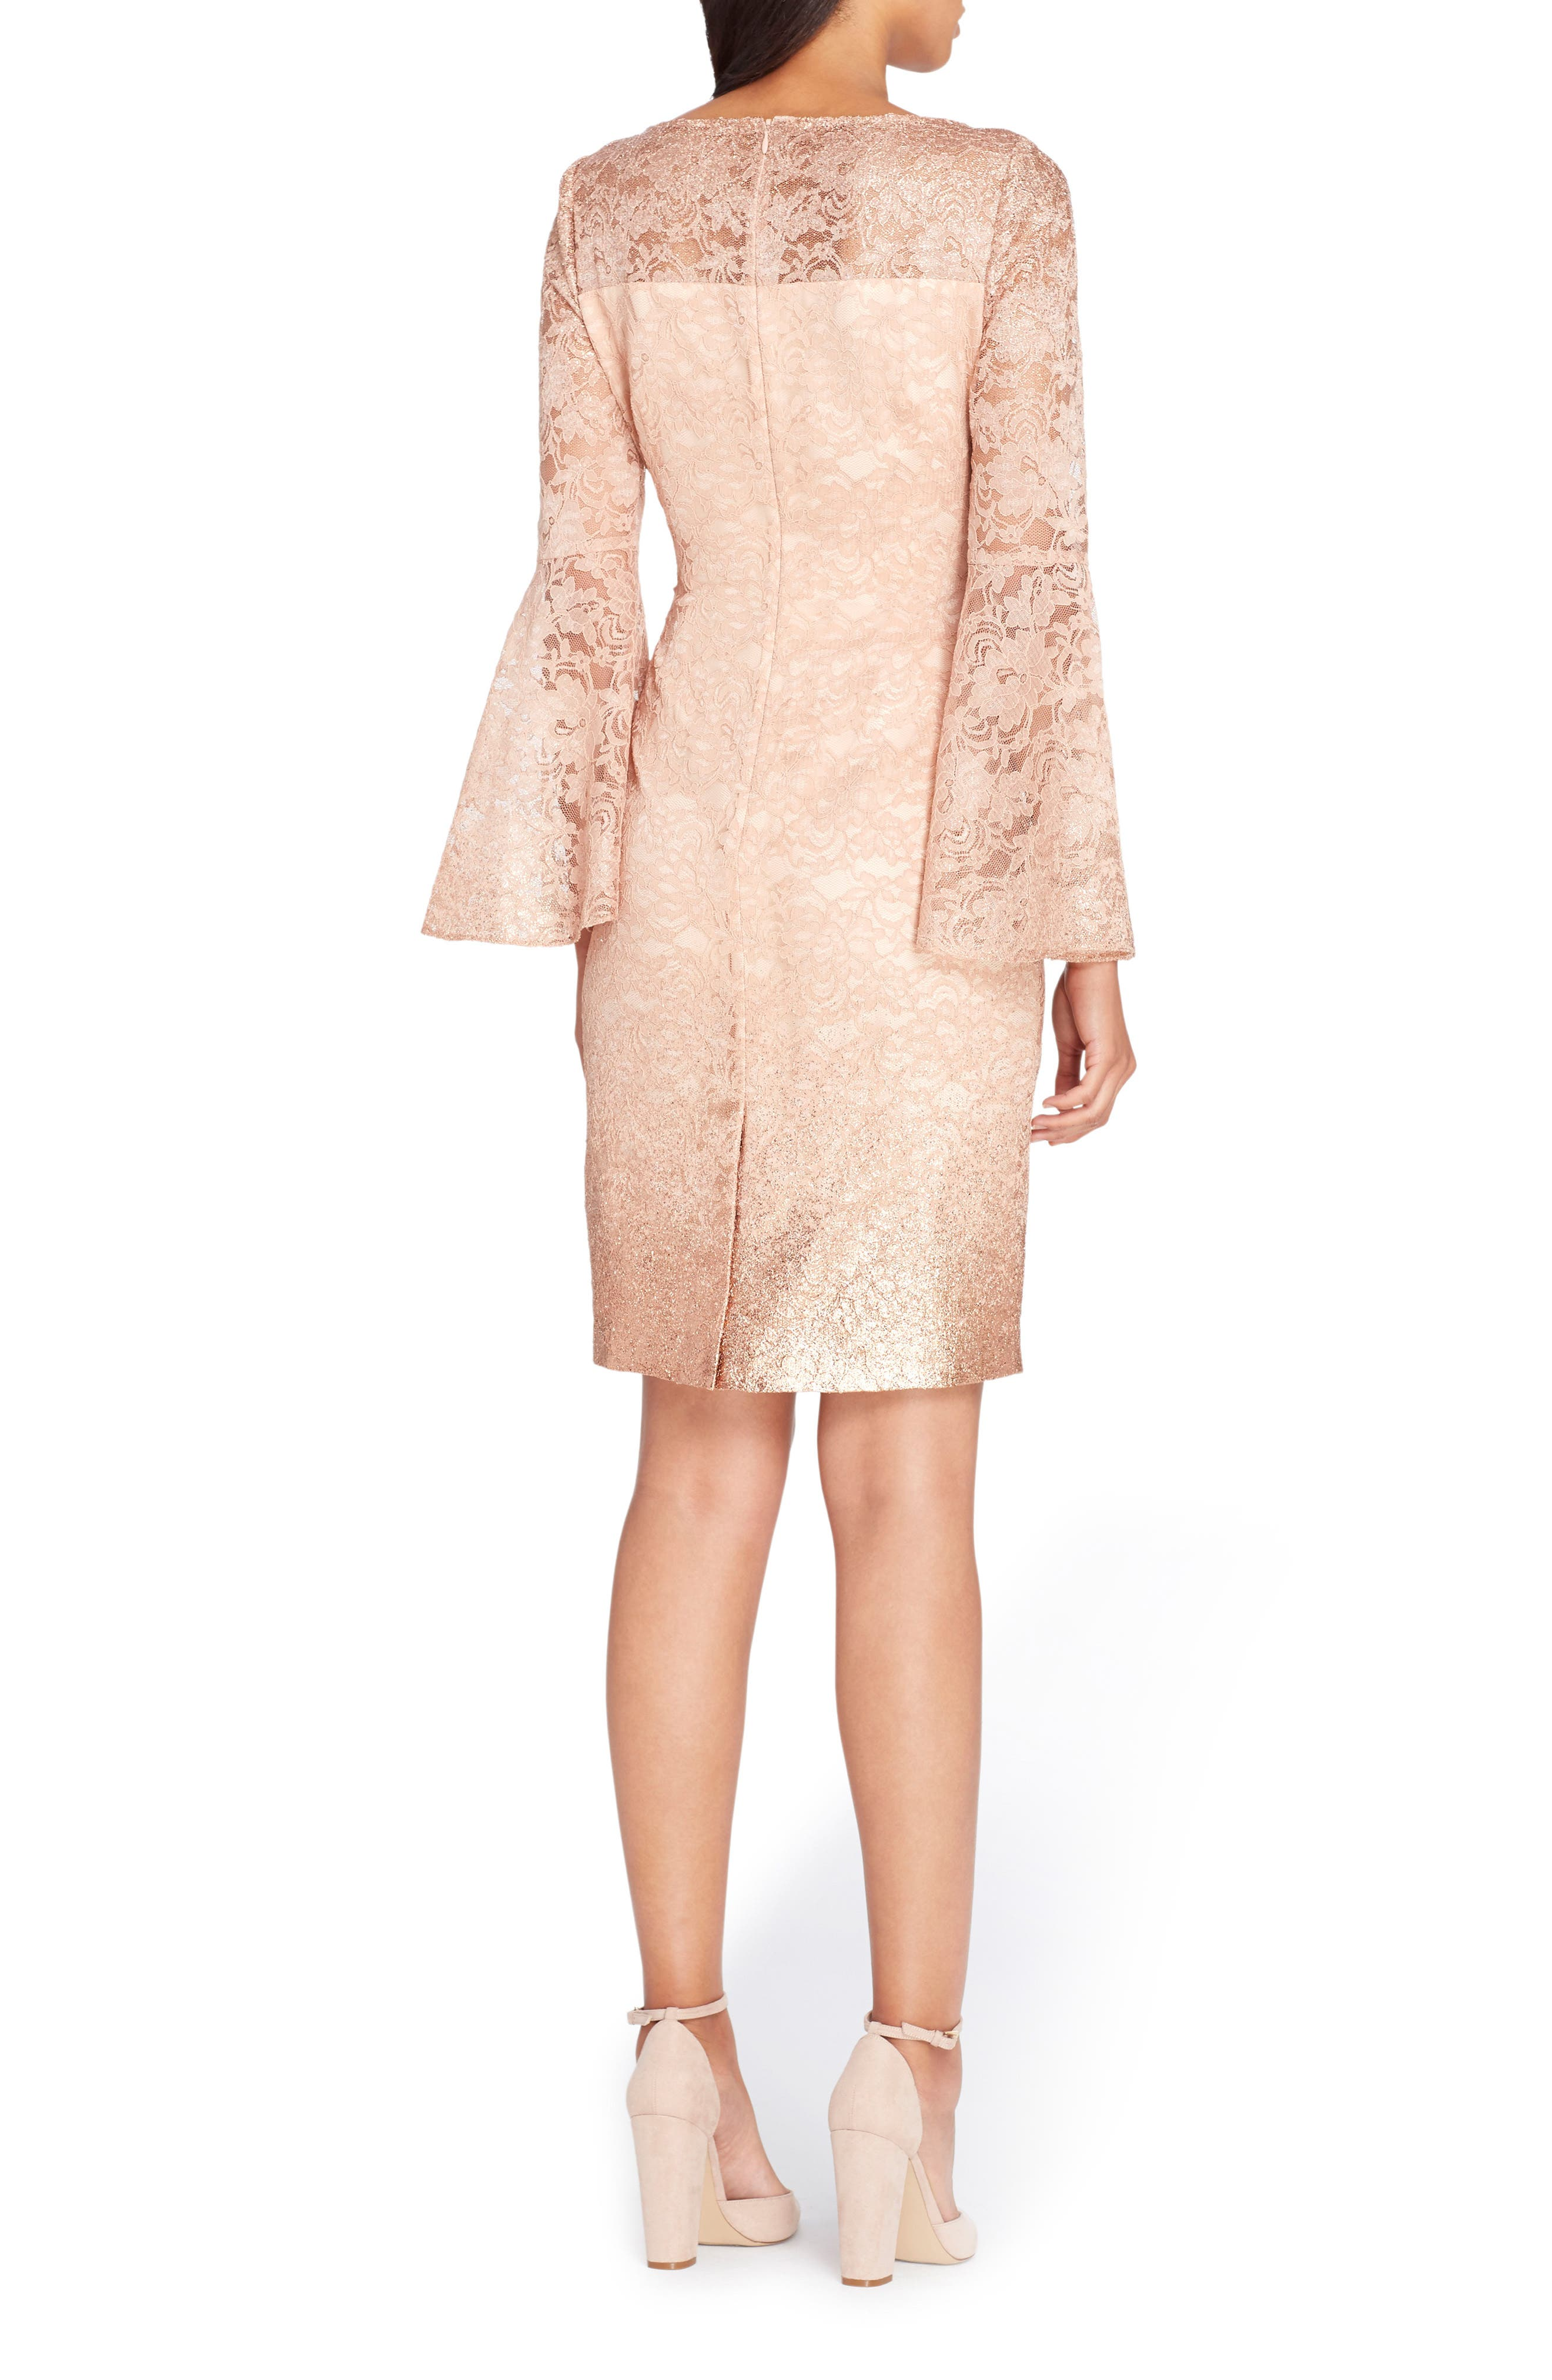 Lace Bell Sleeve Sheath Dress,                             Alternate thumbnail 2, color,                             679